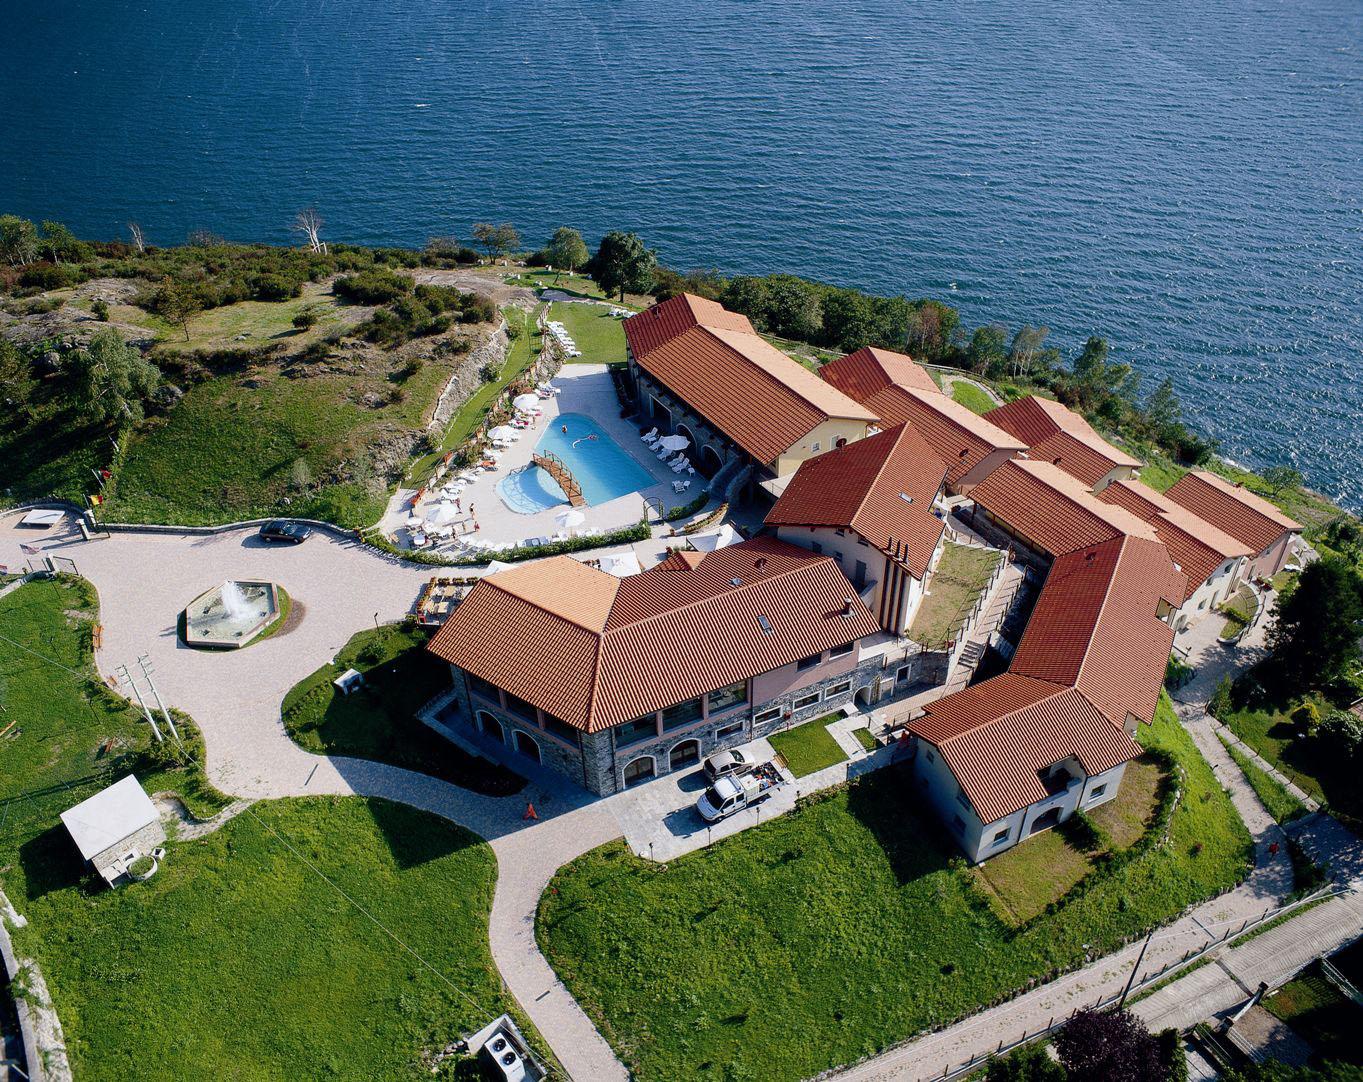 Residence Turistico Alberghiero Oasi die Celti